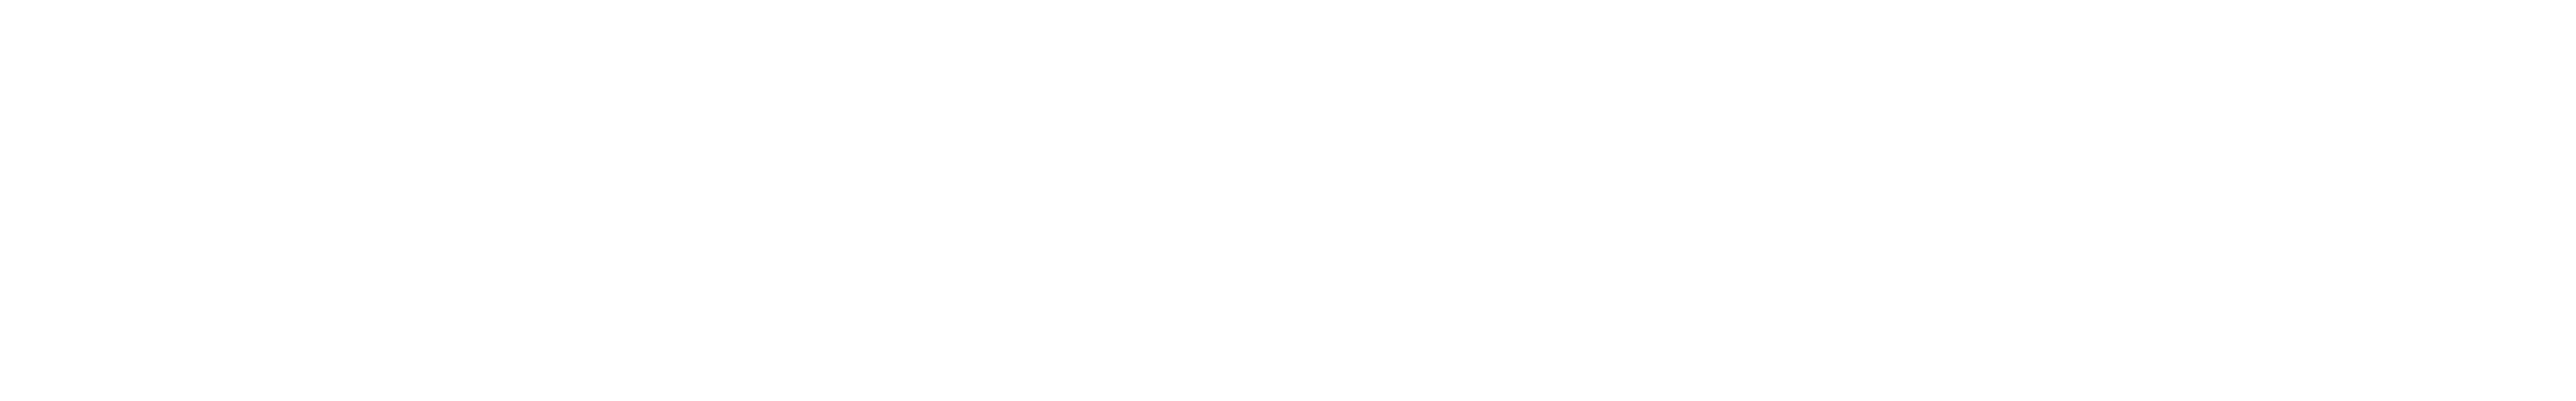 Pakistan Journal of Women's Studies: Alam-e-Niswan